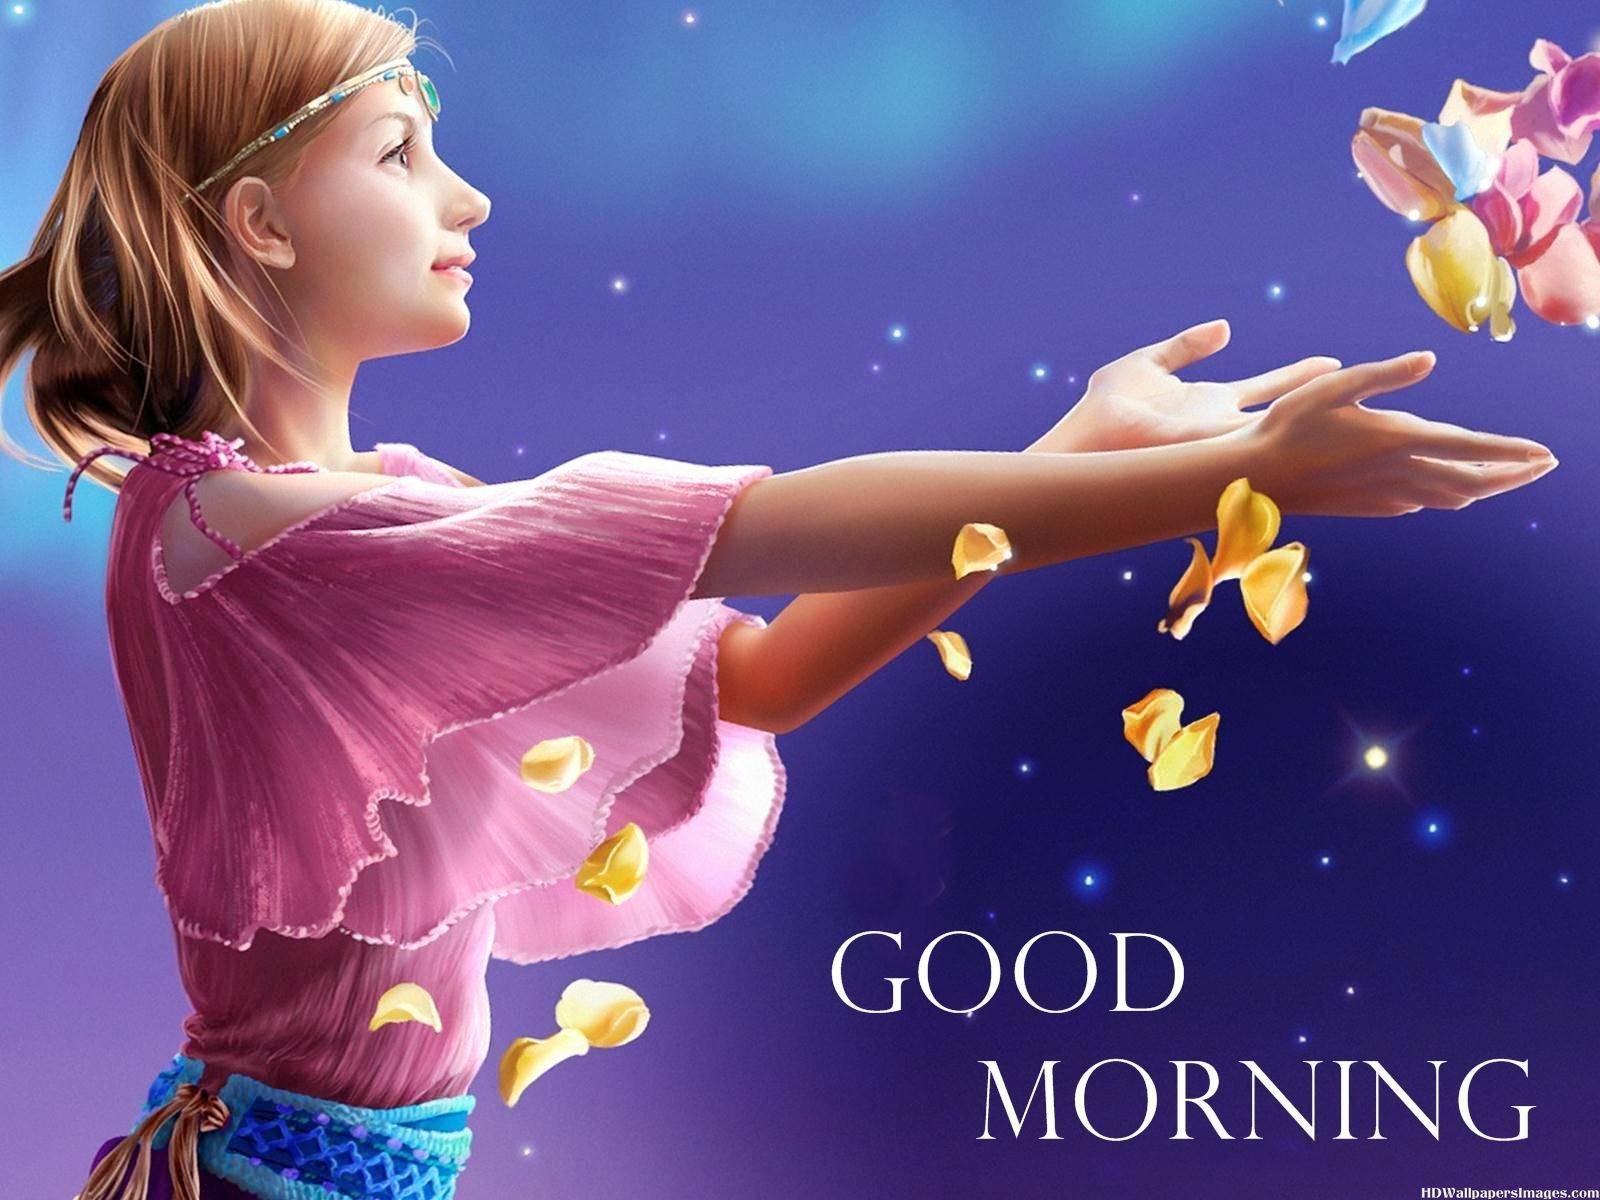 Good morning greetings motivational mood wallpaper 1600x1200 426358 wallpaperup - Happy mood wallpaper ...